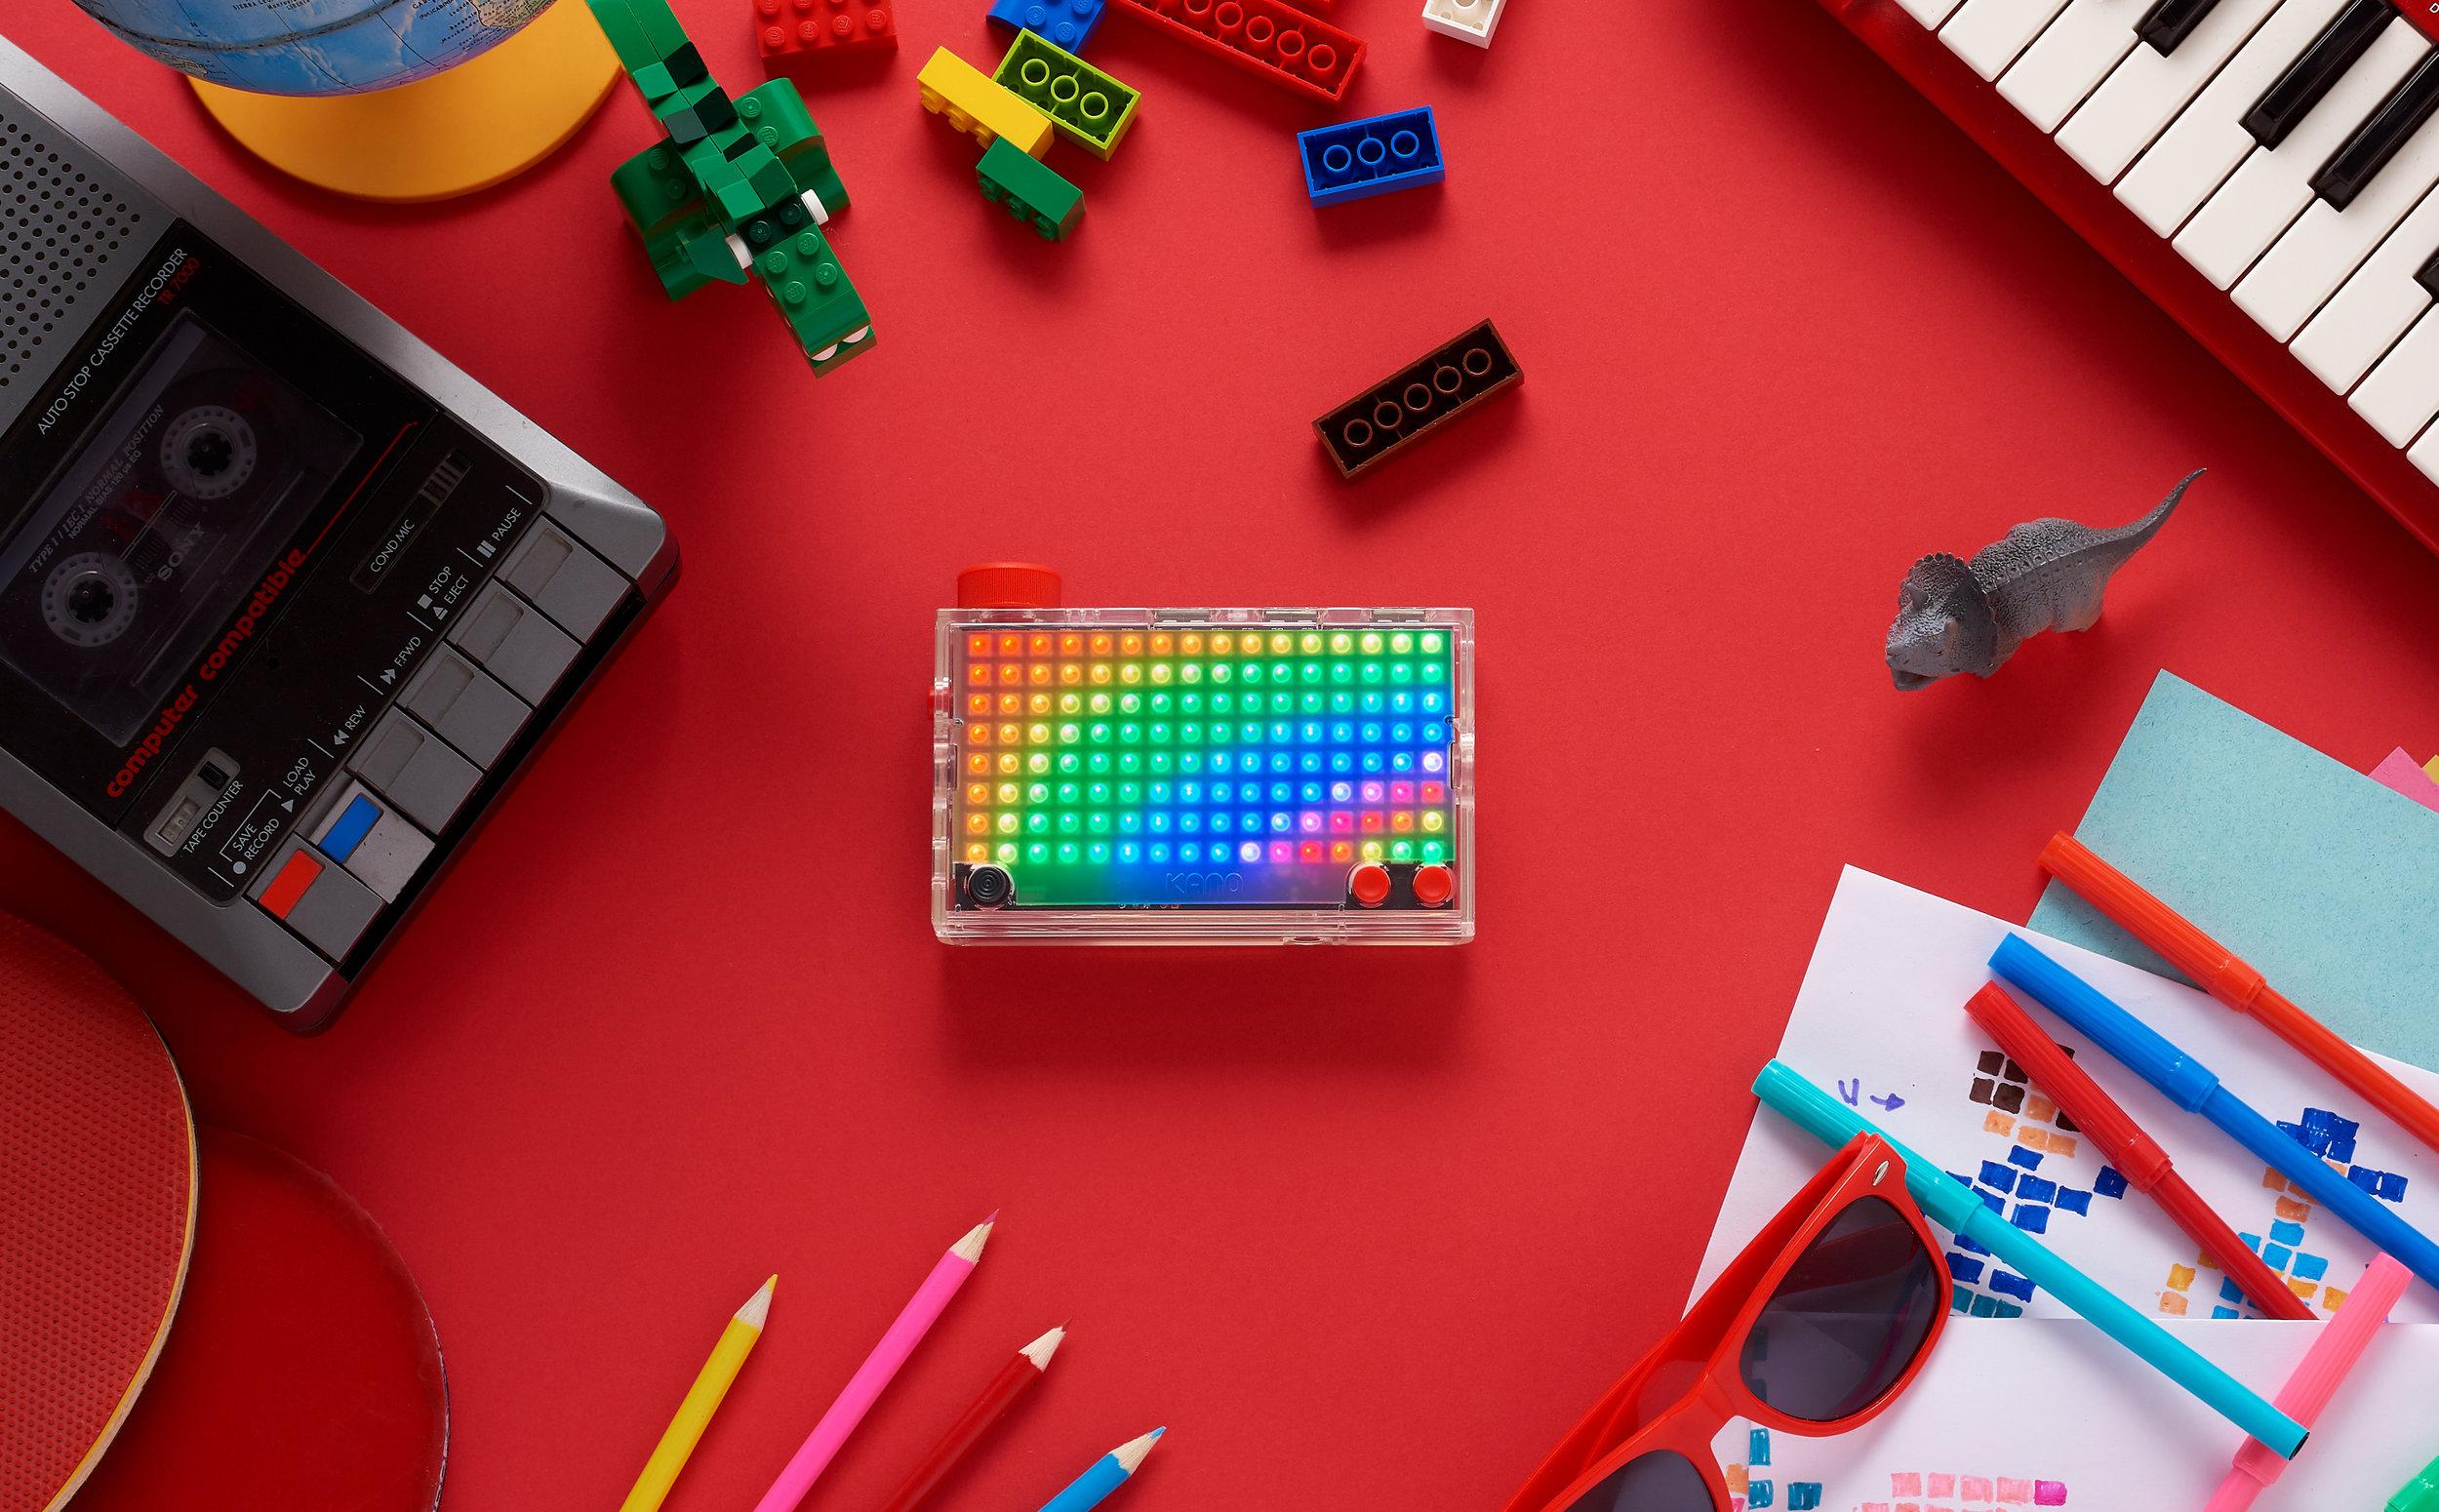 Flat_Red_Rainbow_Bright_RGB.jpg